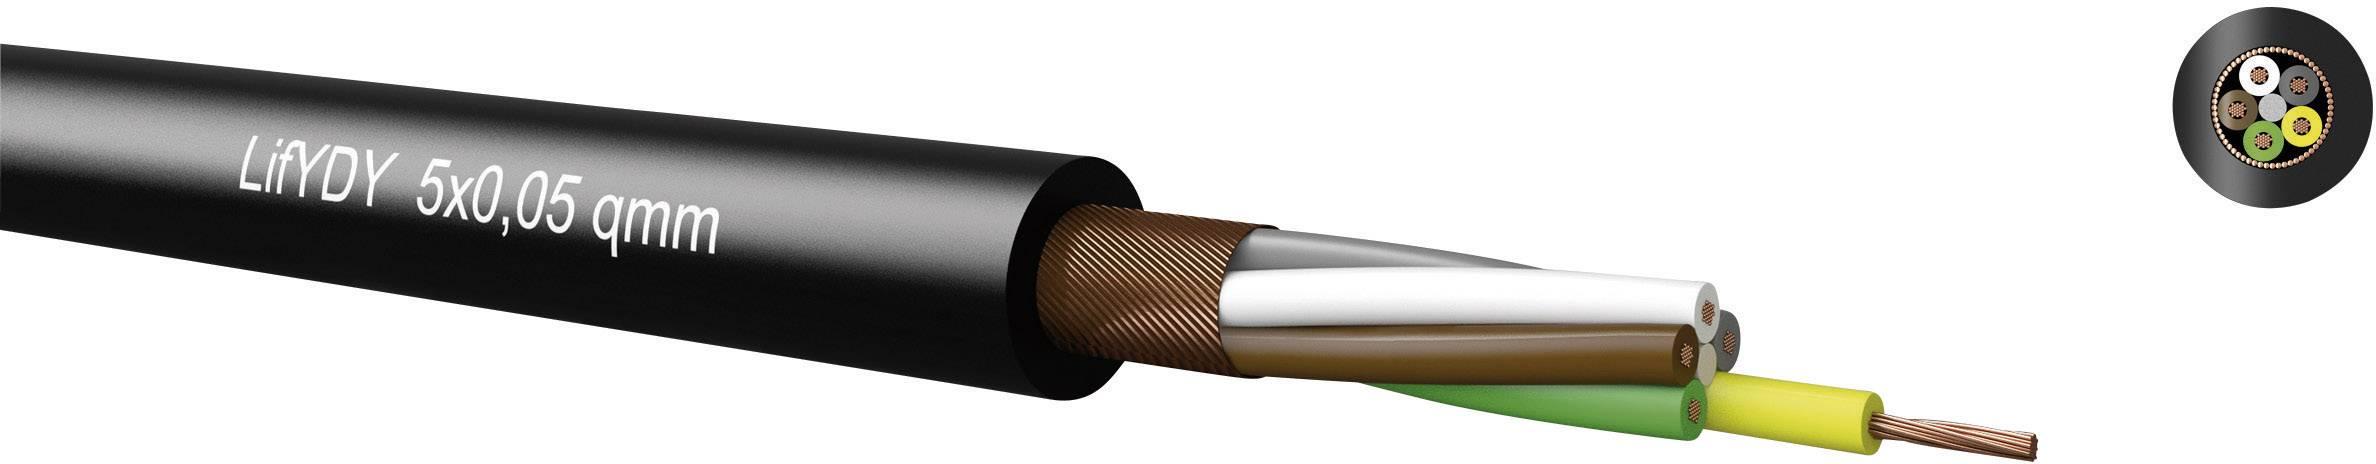 Riadiaci kábel Kabeltronik LifYDY 341201000, 12 x 0.10 mm², vonkajší Ø 5.70 mm, 300 V, metrový tovar, čierna